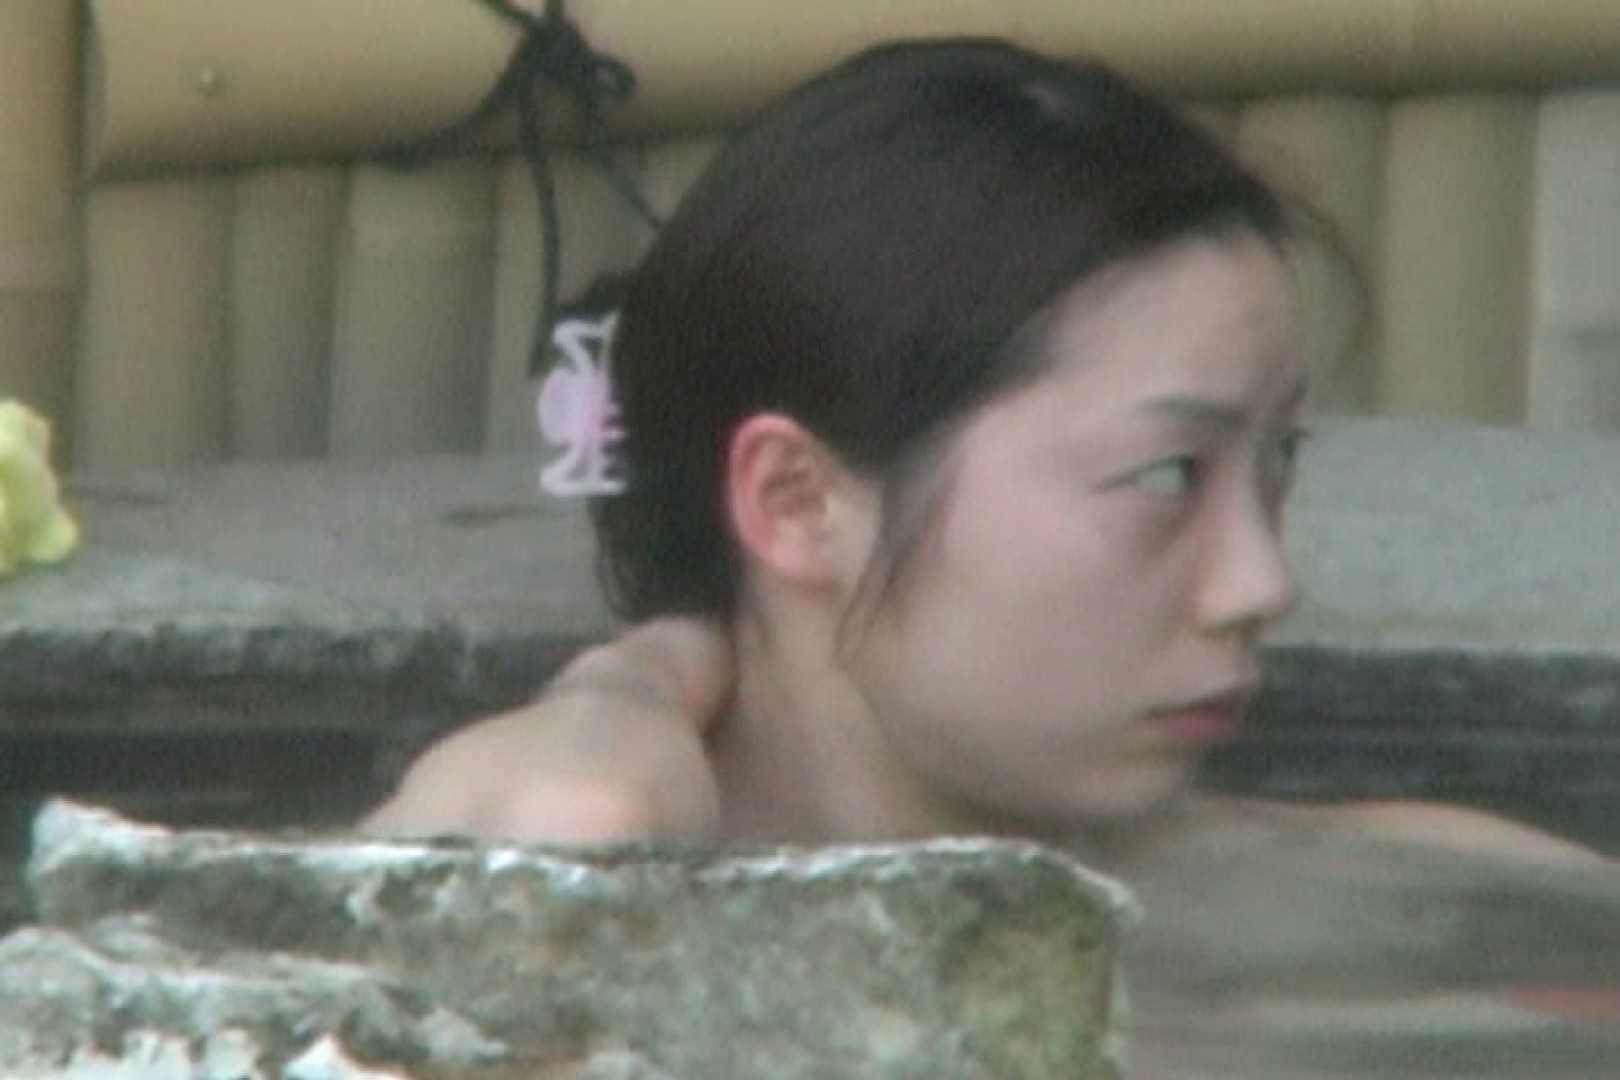 Aquaな露天風呂Vol.596 盗撮シリーズ | 露天風呂編  113PIX 19